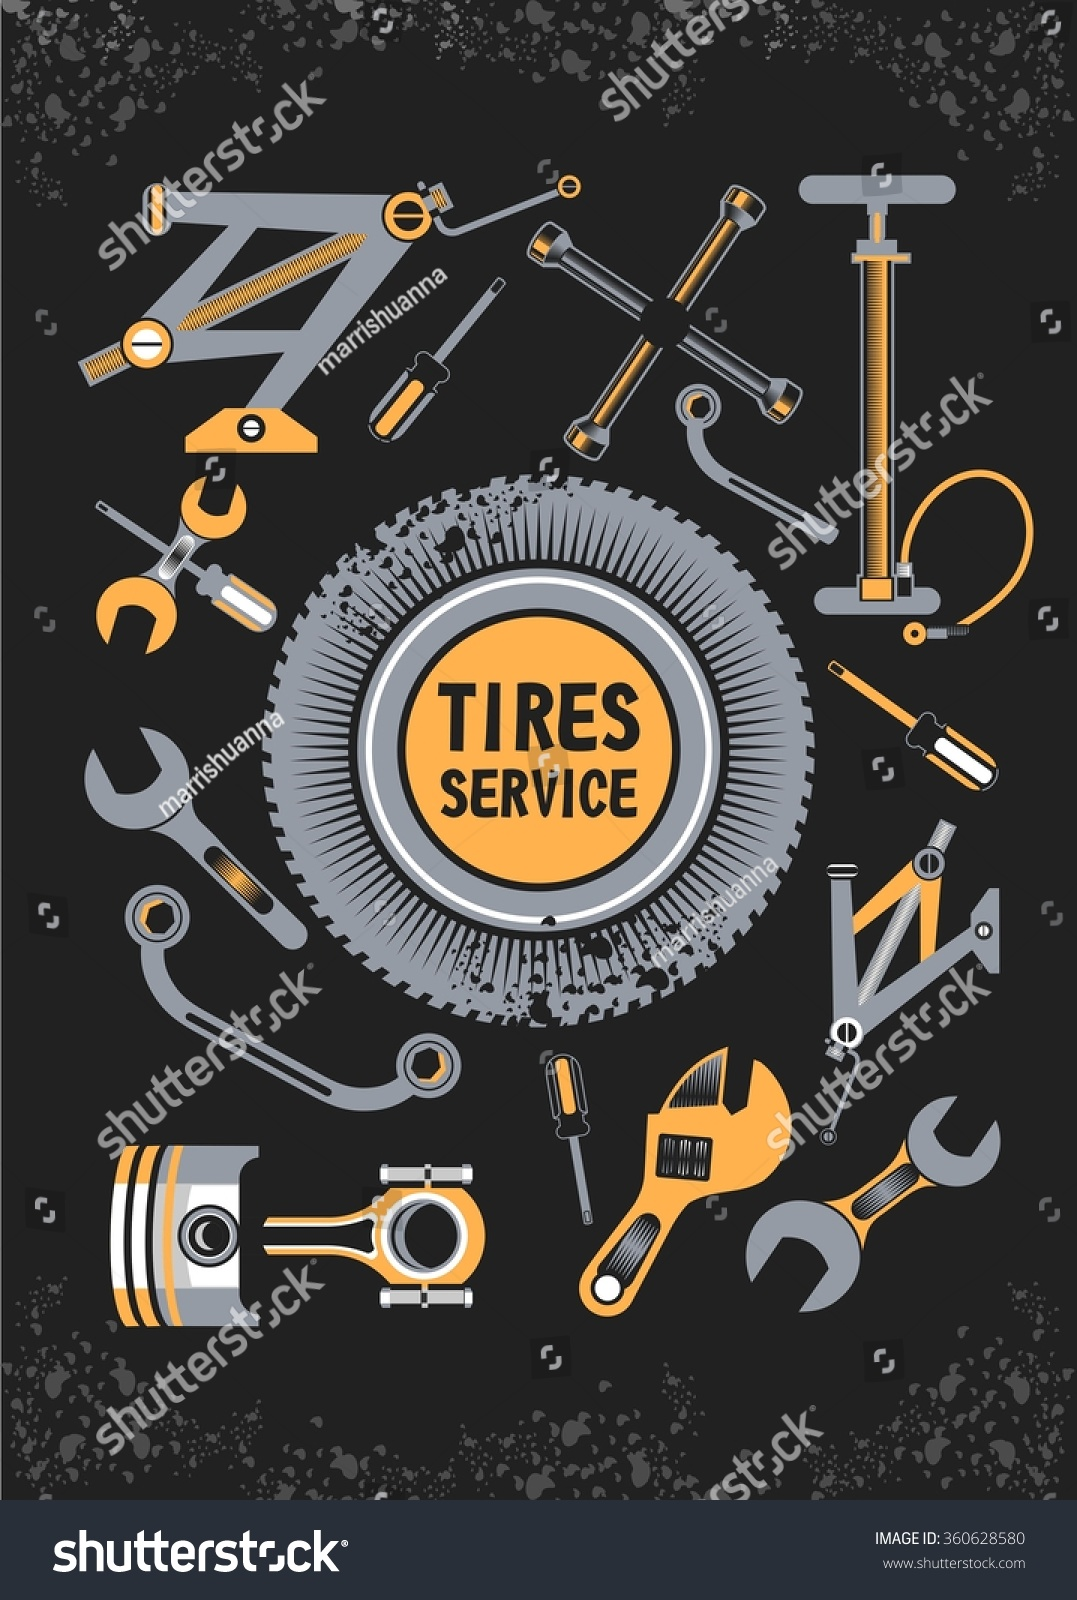 Vector Set Tools Spare Parts Car Stock Vector 360628580 - Shutterstock